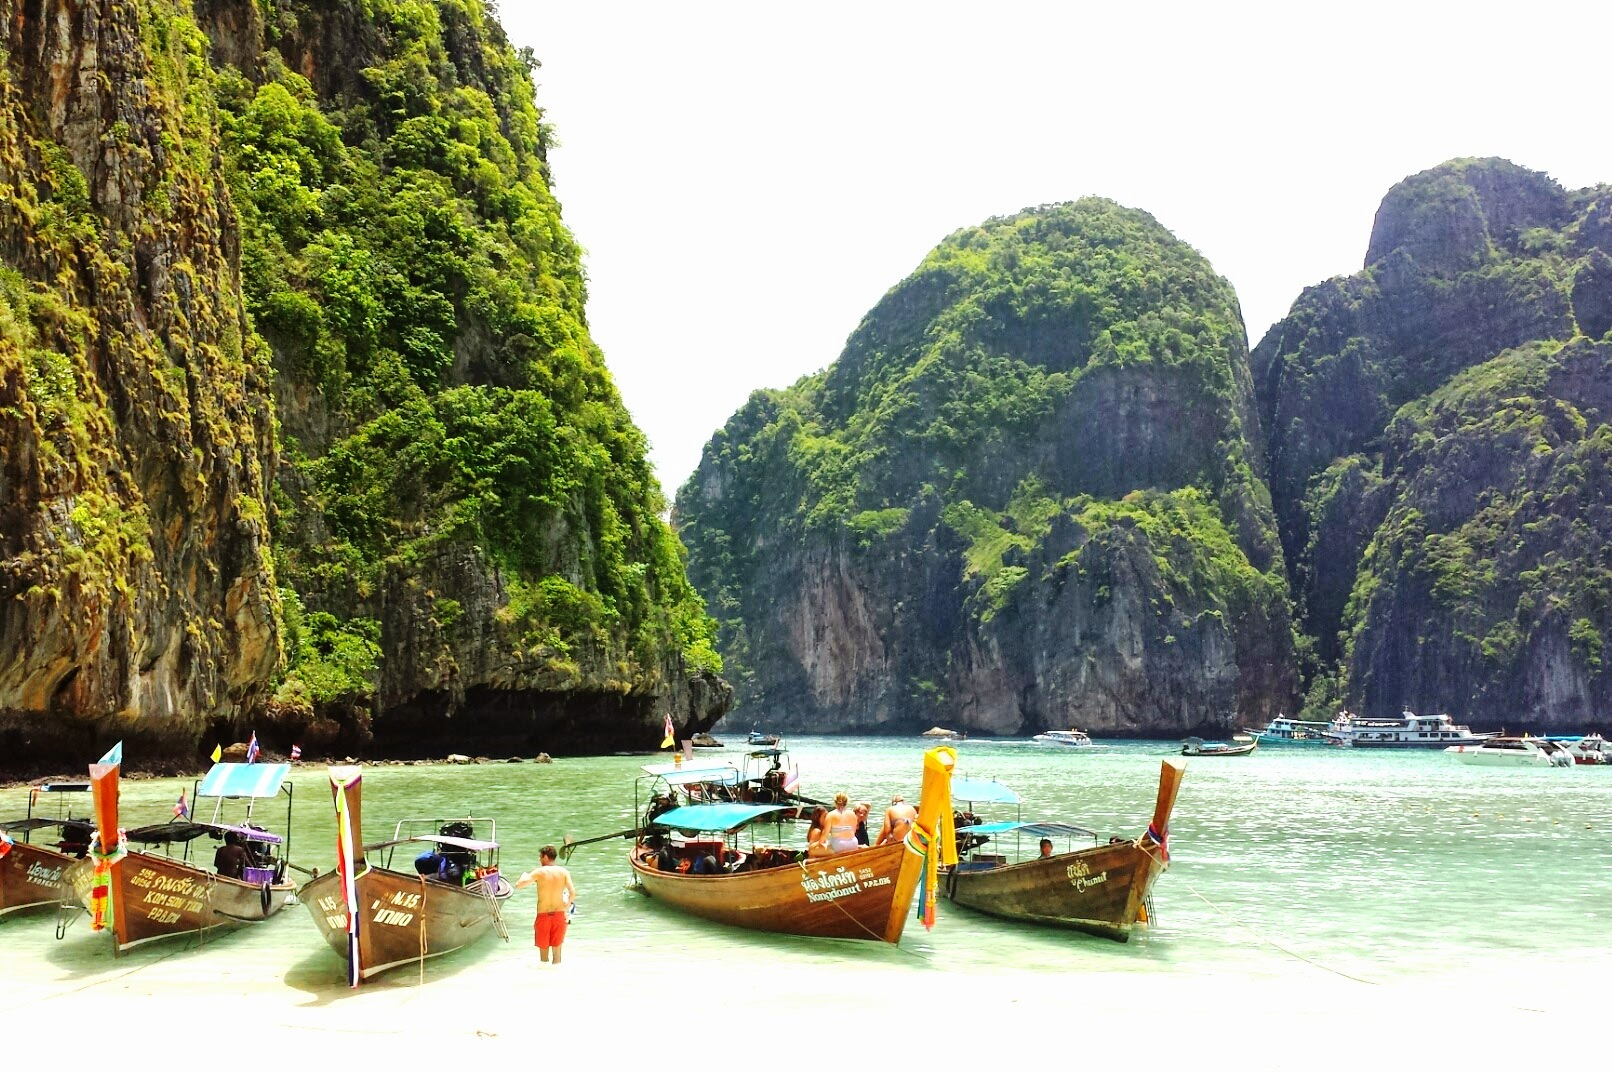 Phuket and Phi Phi's hotspots